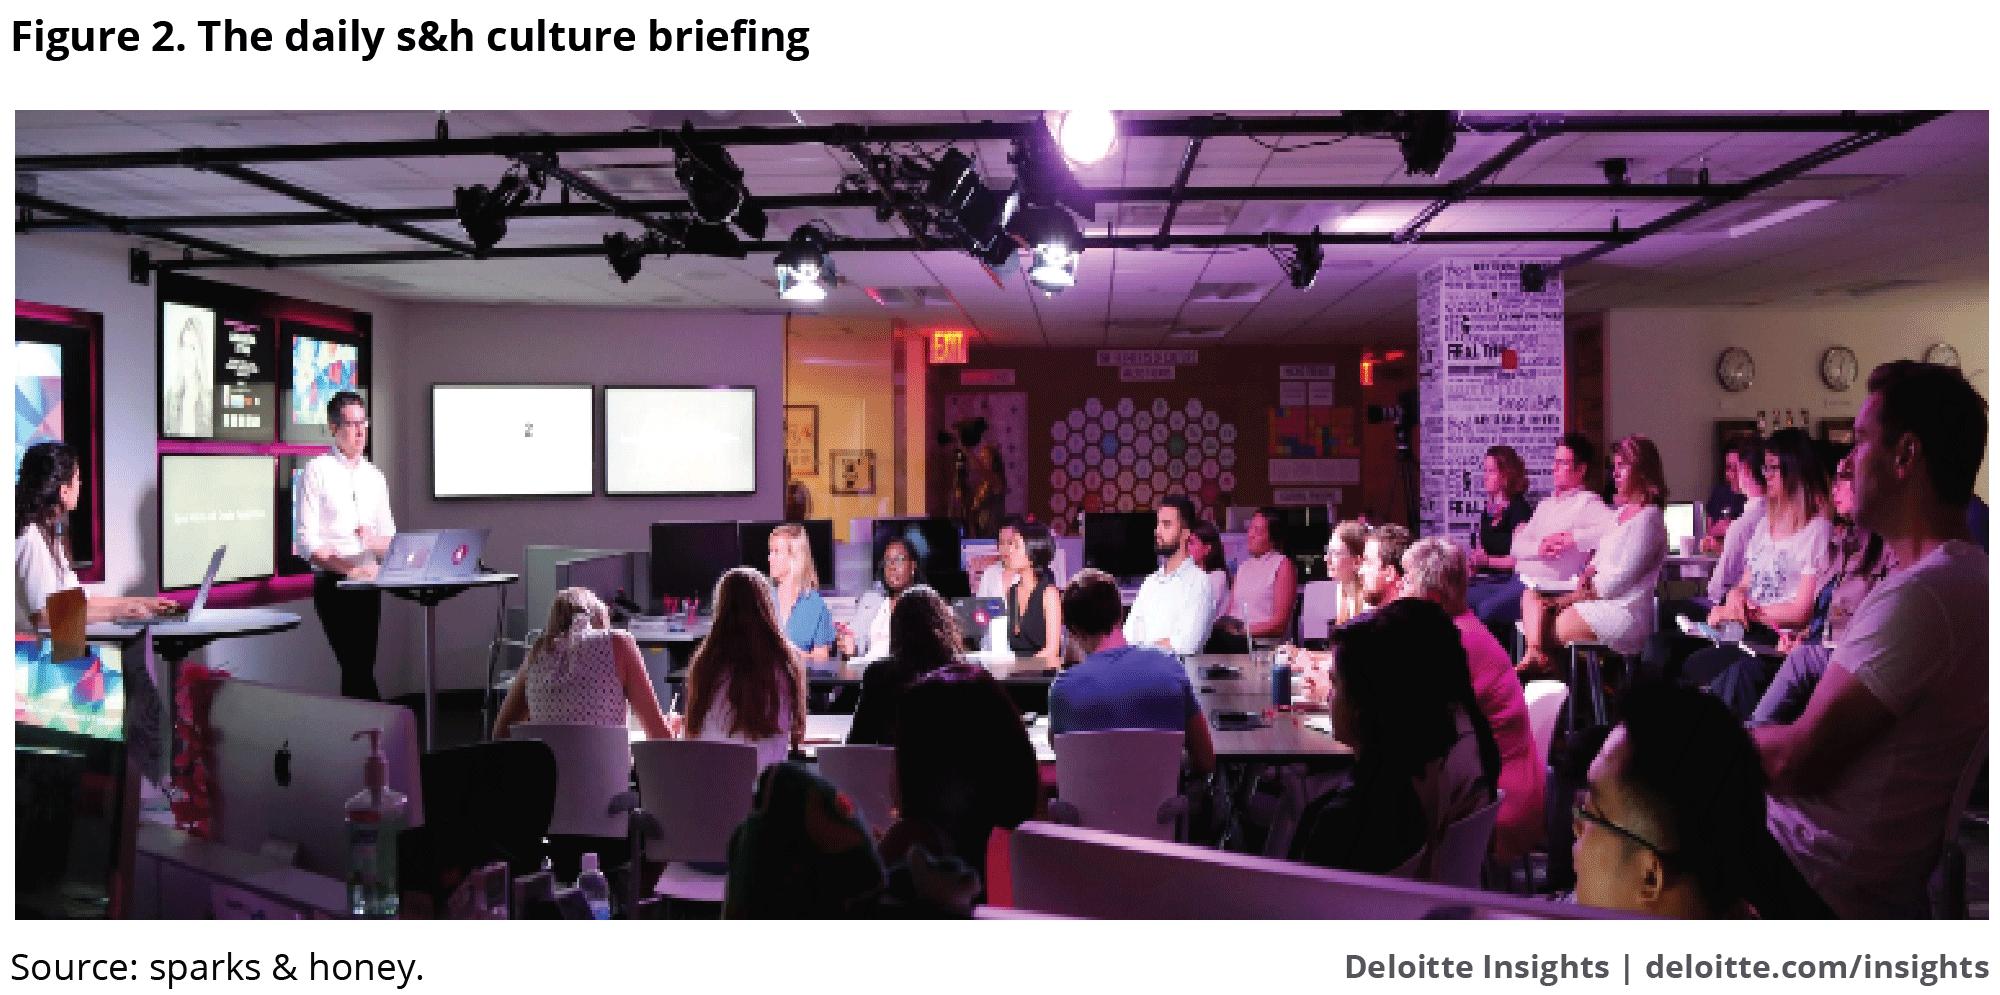 Sparks & Honey Business Practice Case Study | Deloitte Insights